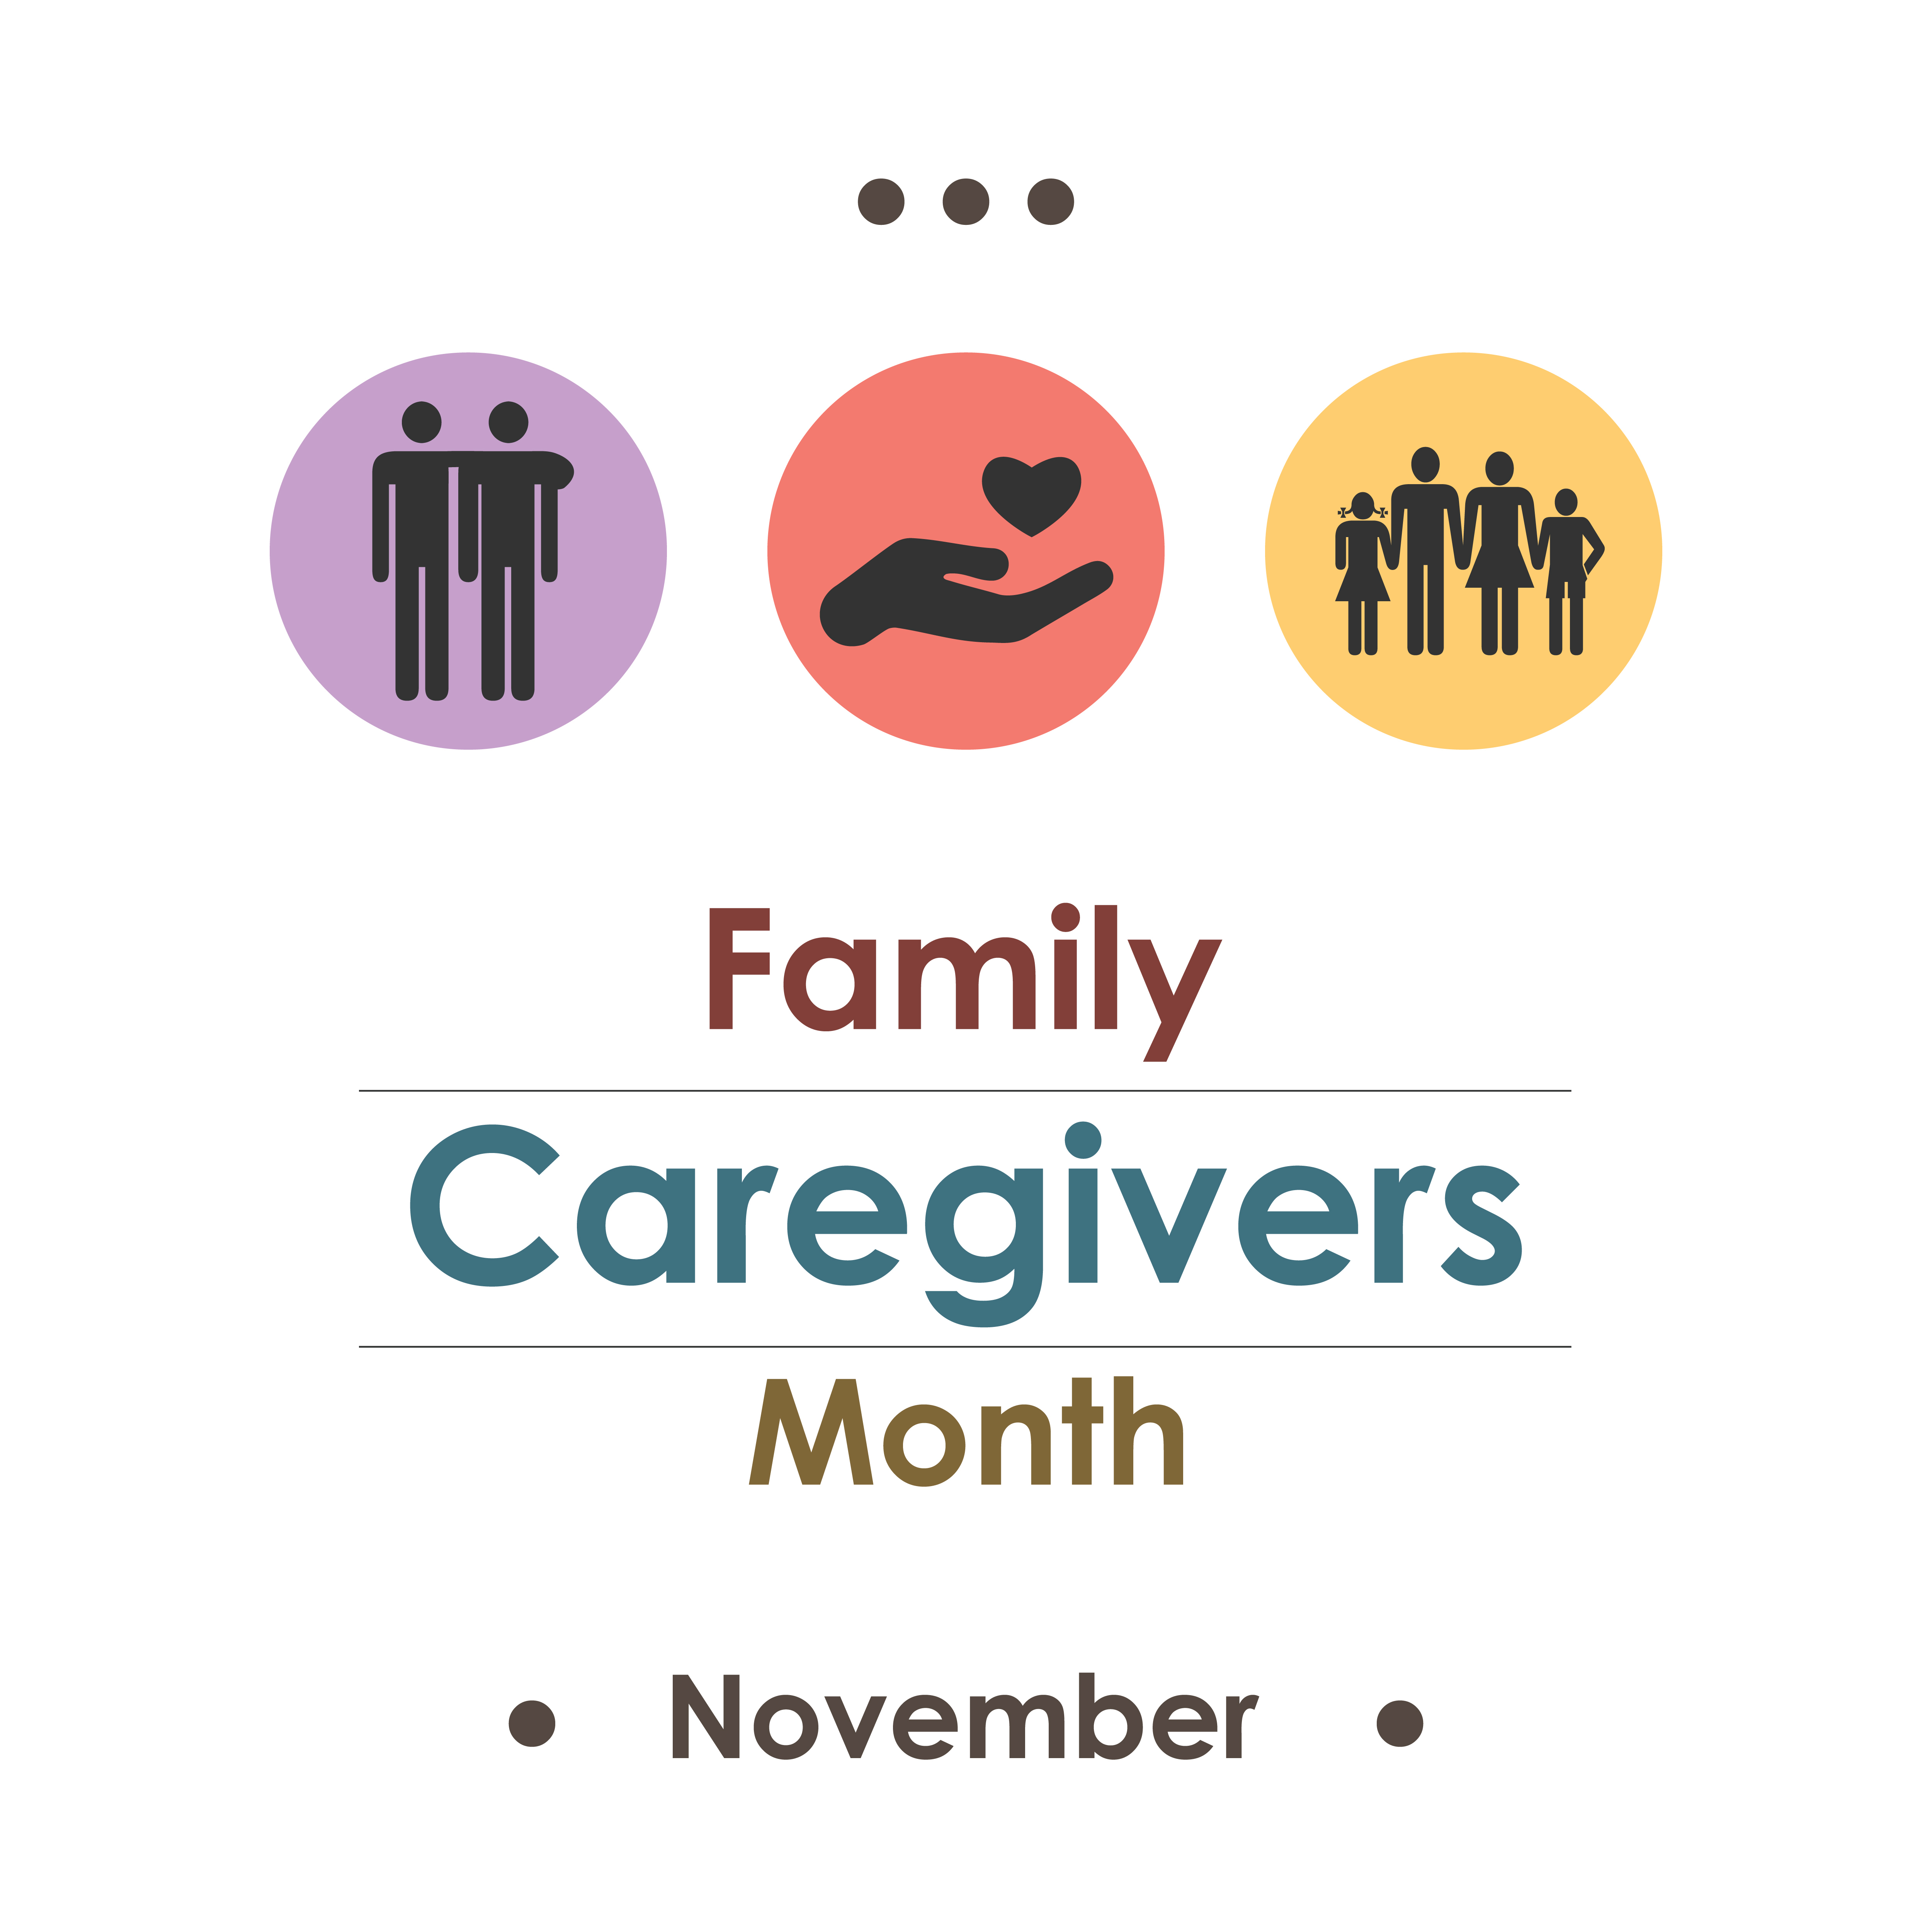 family-caregivers-month-november